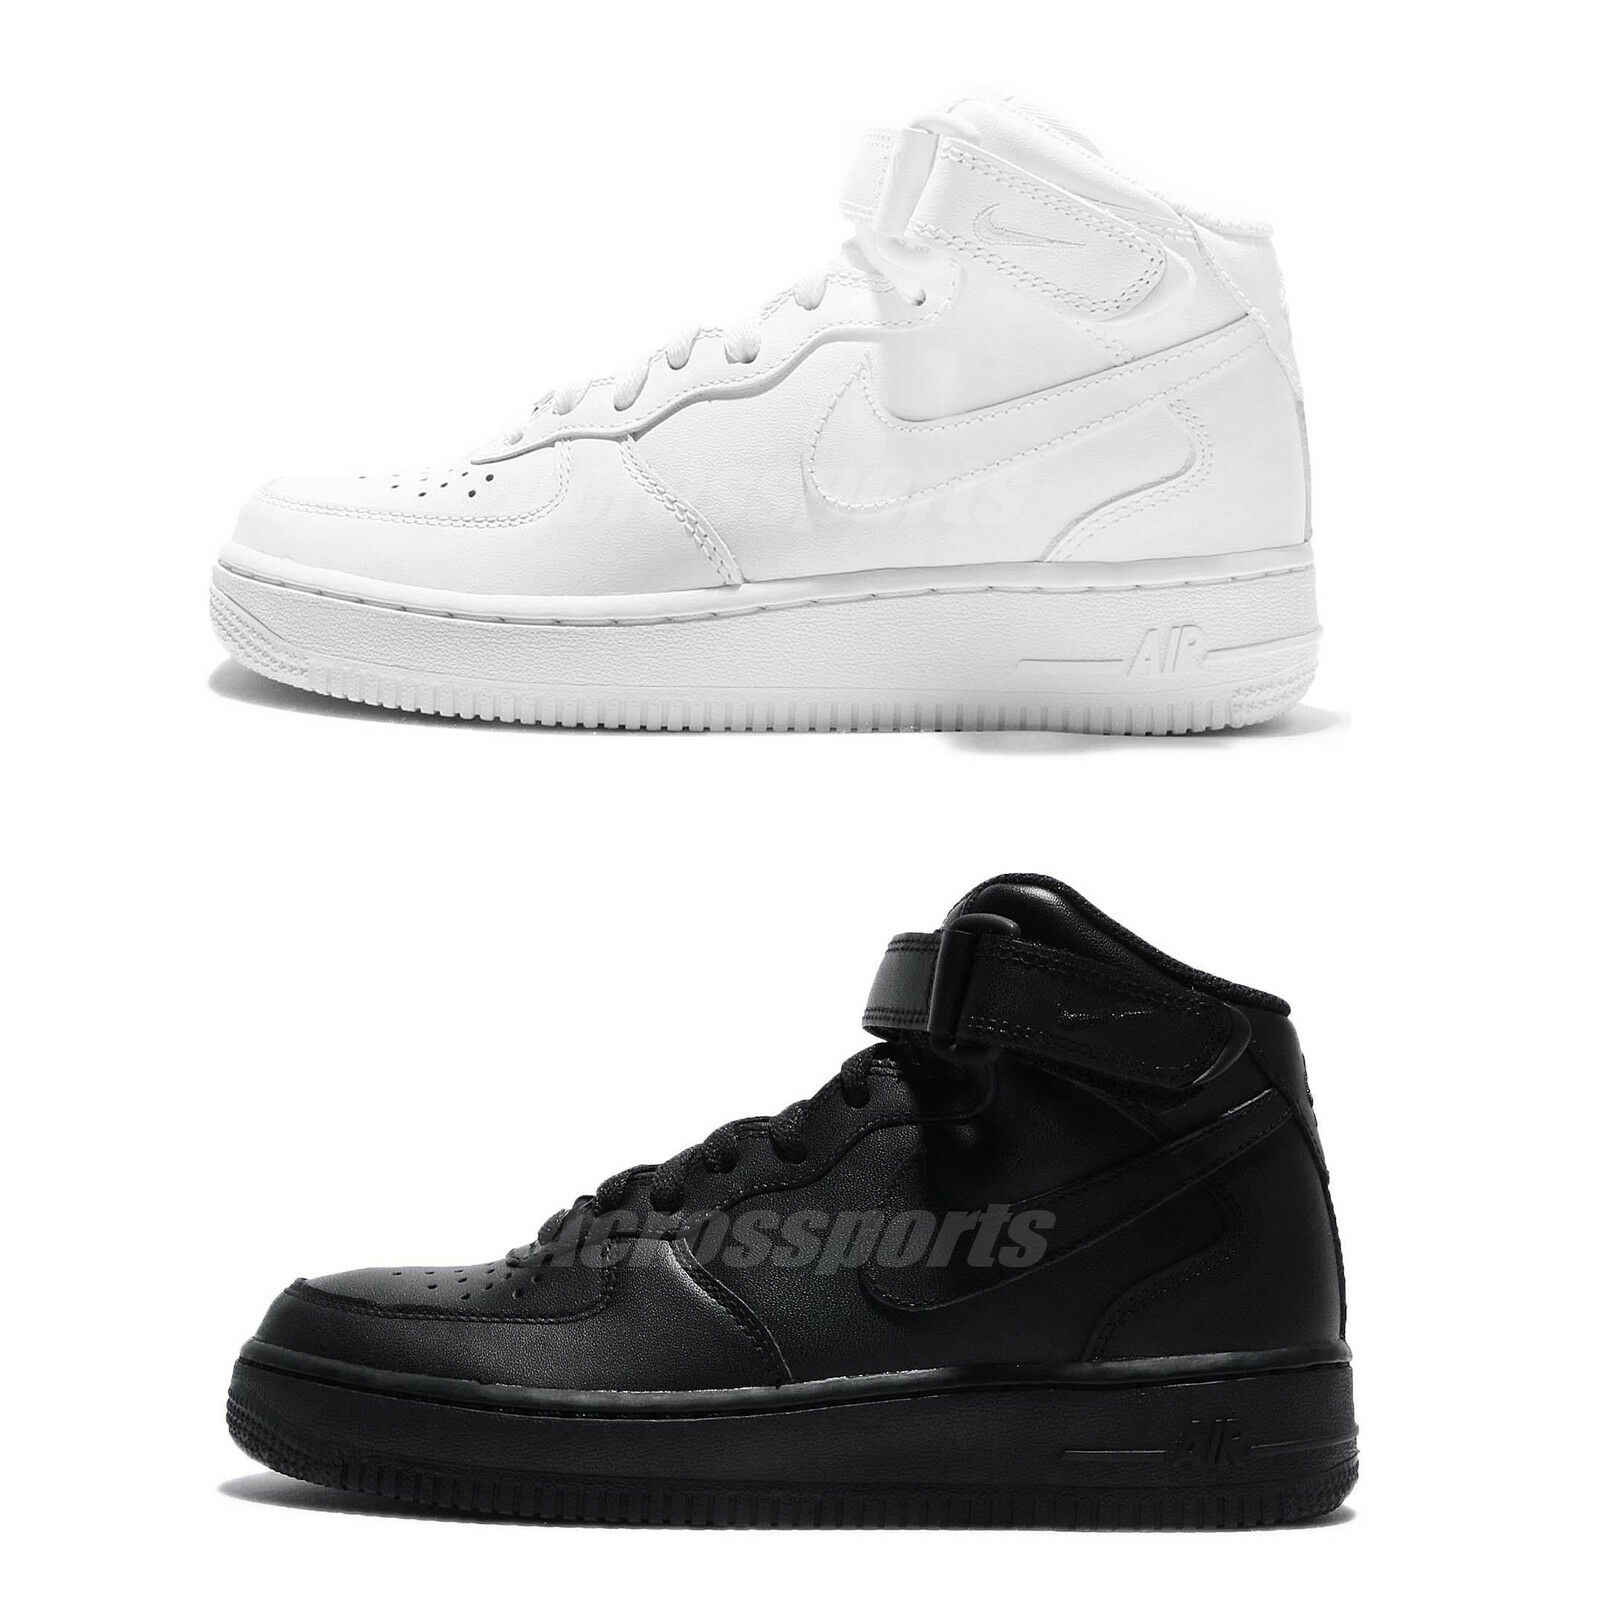 Nike Air Force  1 Mid 07 LE One nero   bianca Men Classic Scarpe scarpe da ginnastica Pick 1  vendite dirette della fabbrica